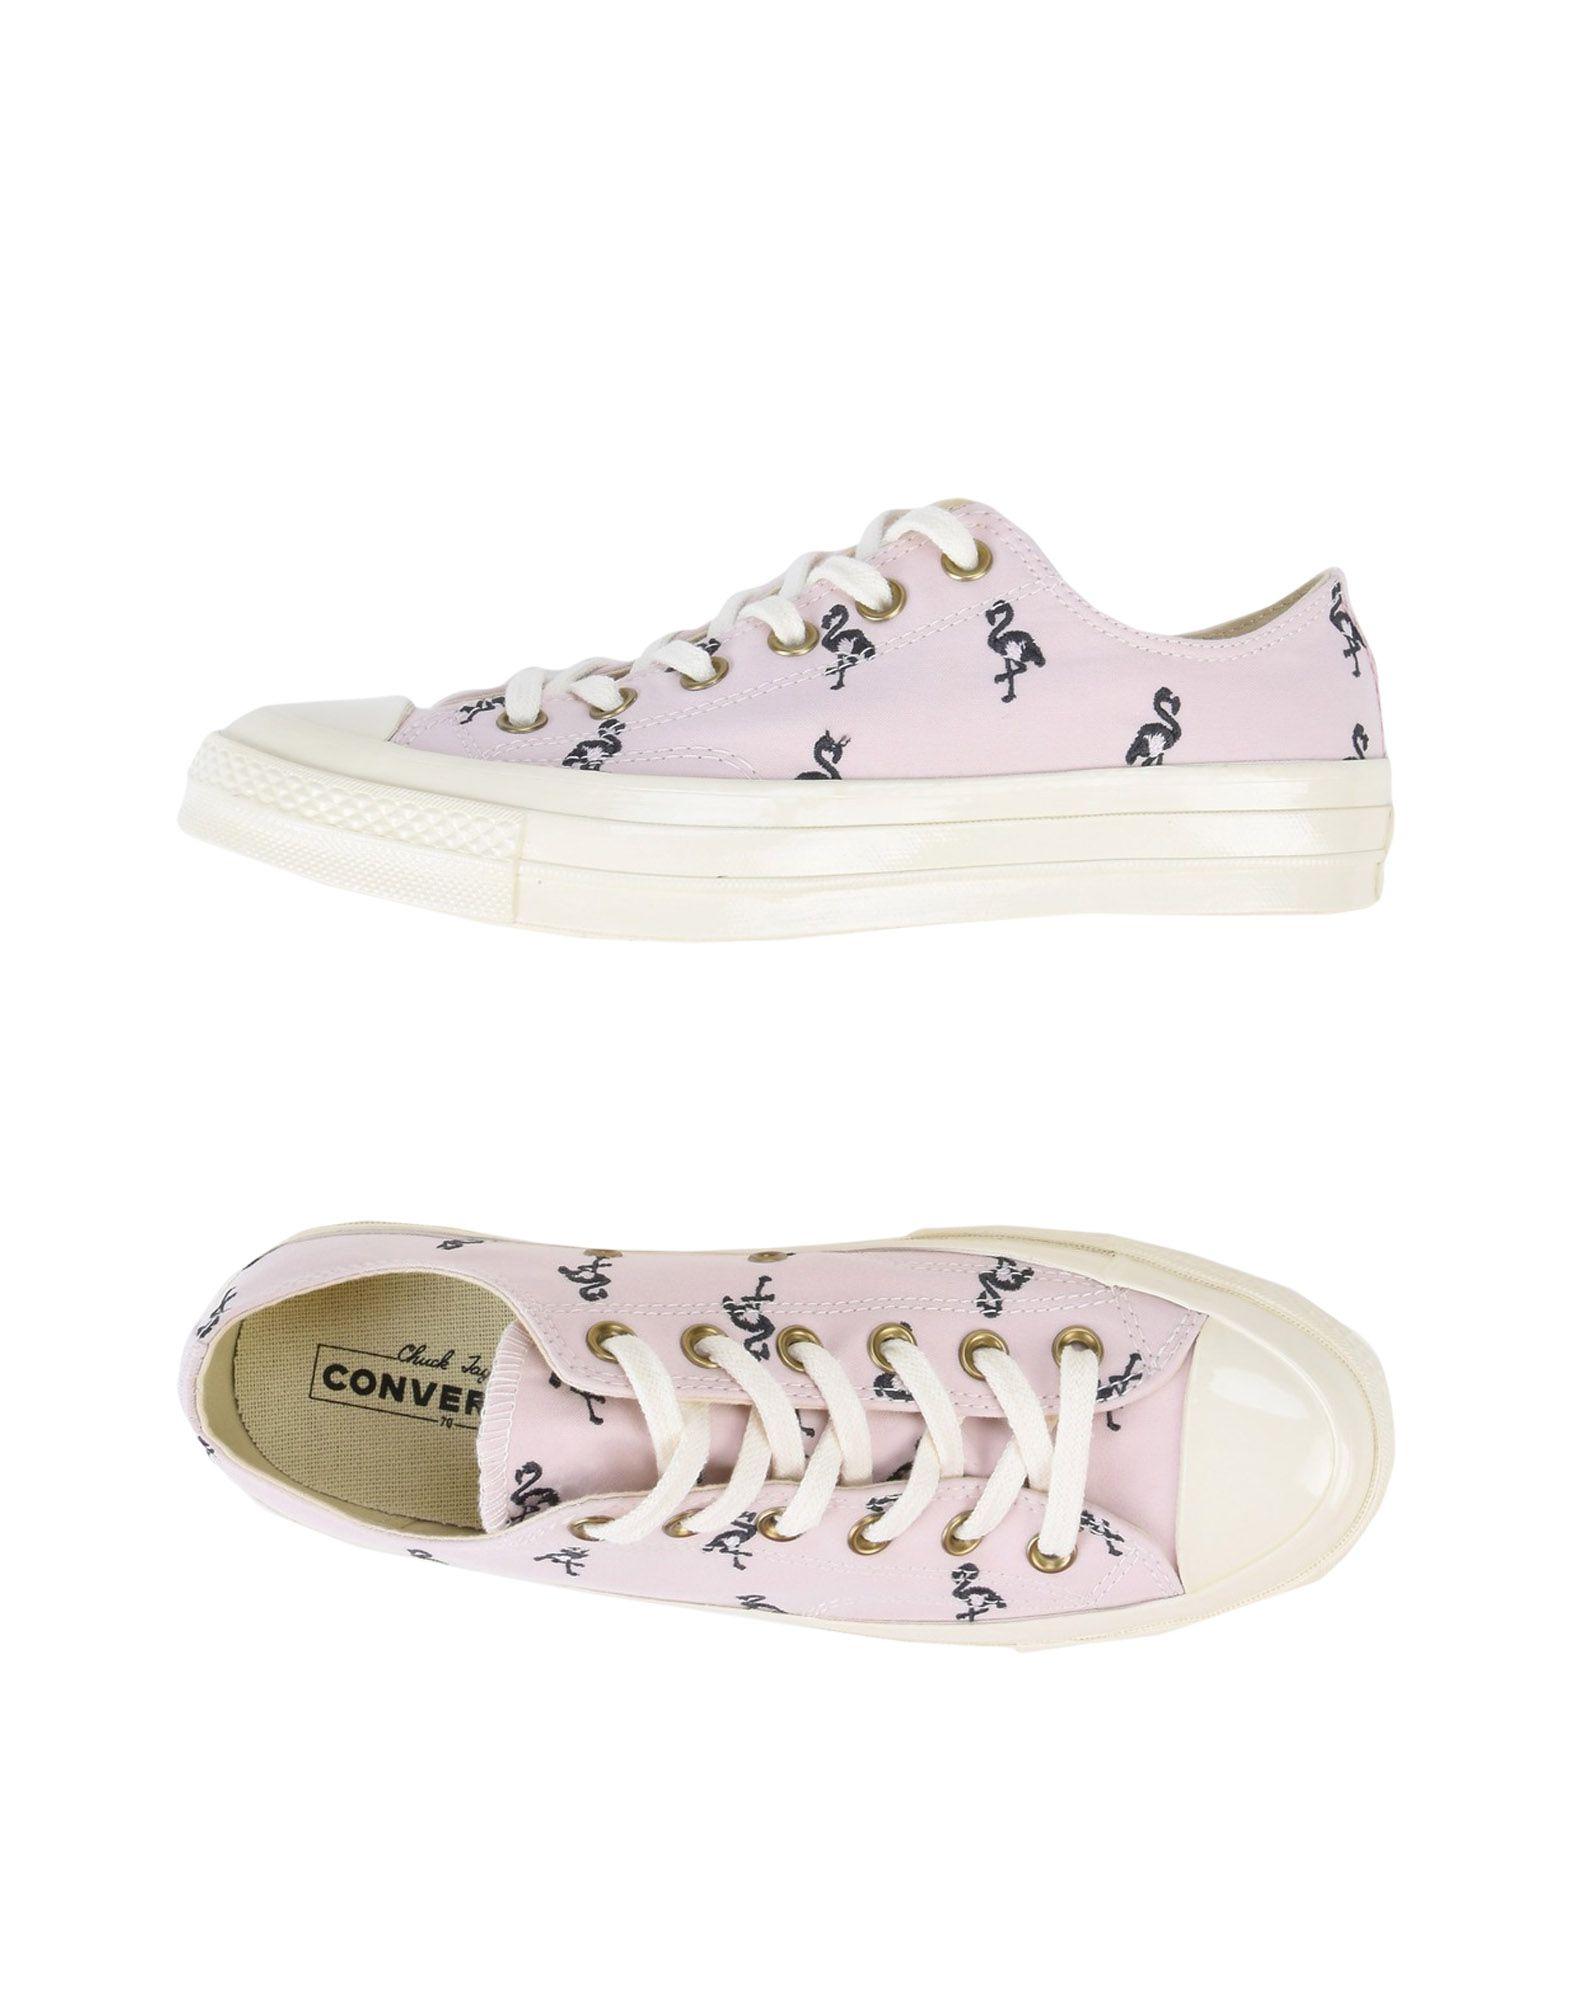 Converse All Star Chuck Taylor All Star 70 Ox Textile Qualität Prep Embroidery 11512282KV Gute Qualität Textile beliebte Schuhe ca26ae